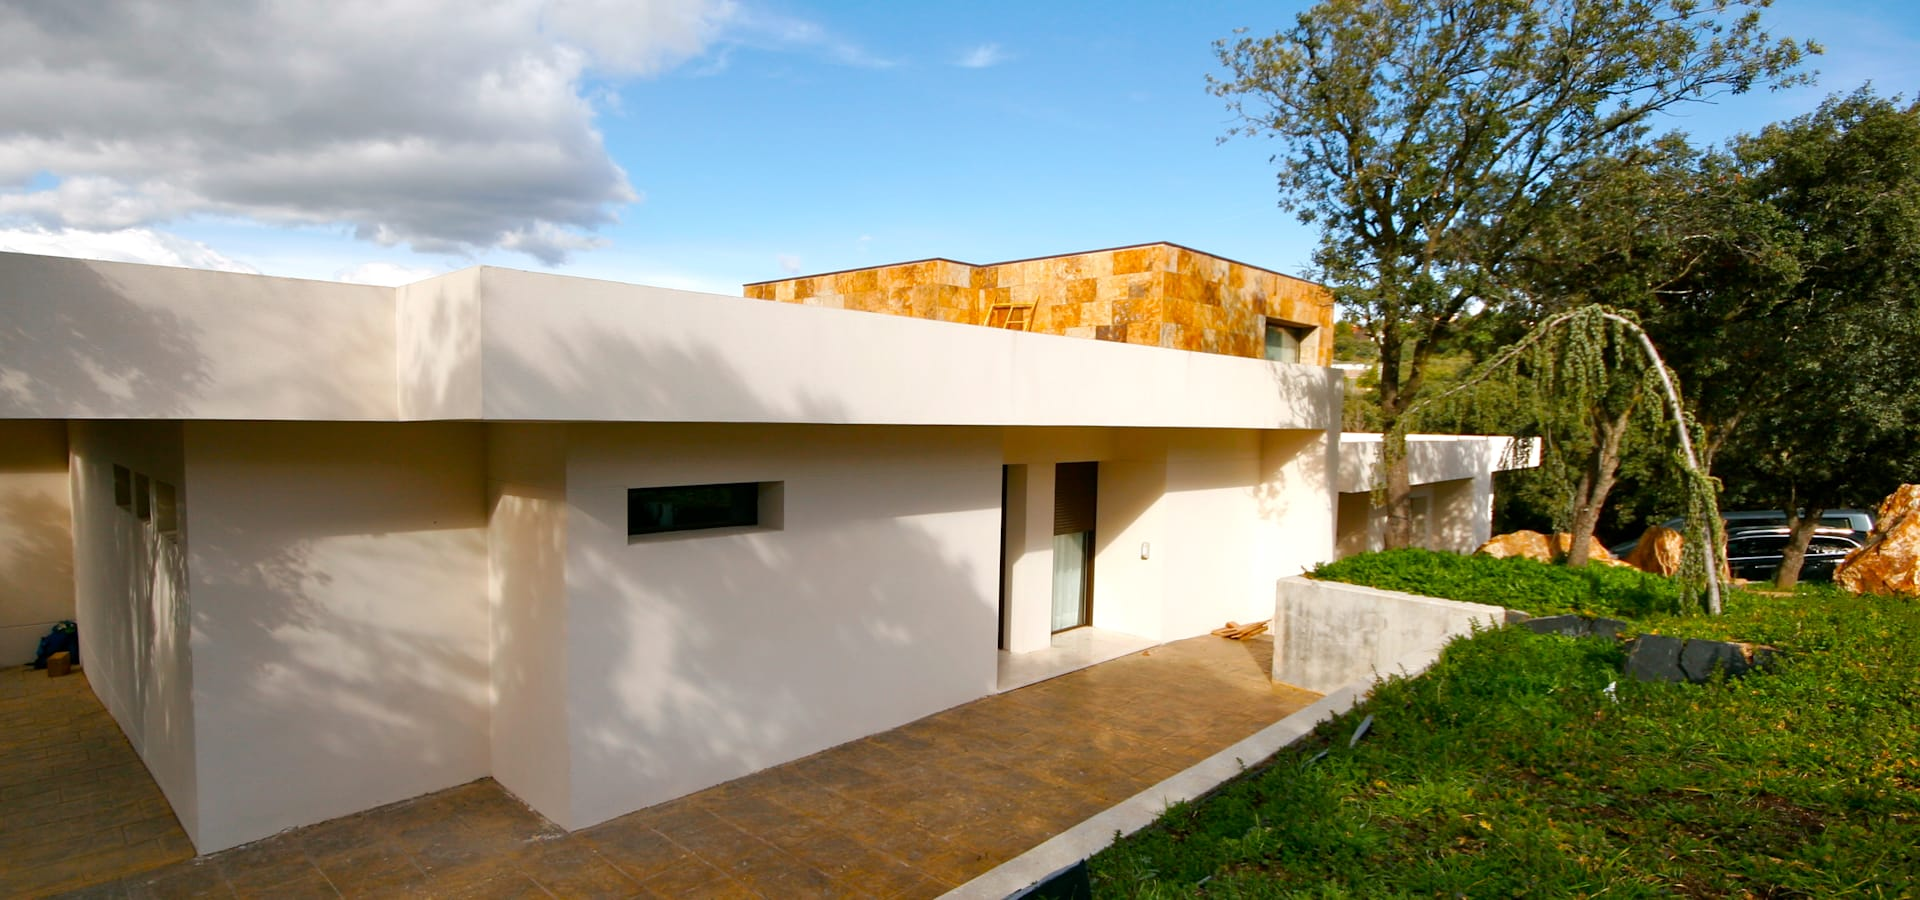 Vivienda en las rozas madrid par valverde arquitectos homify - Maison s par domenack arquitectos ...